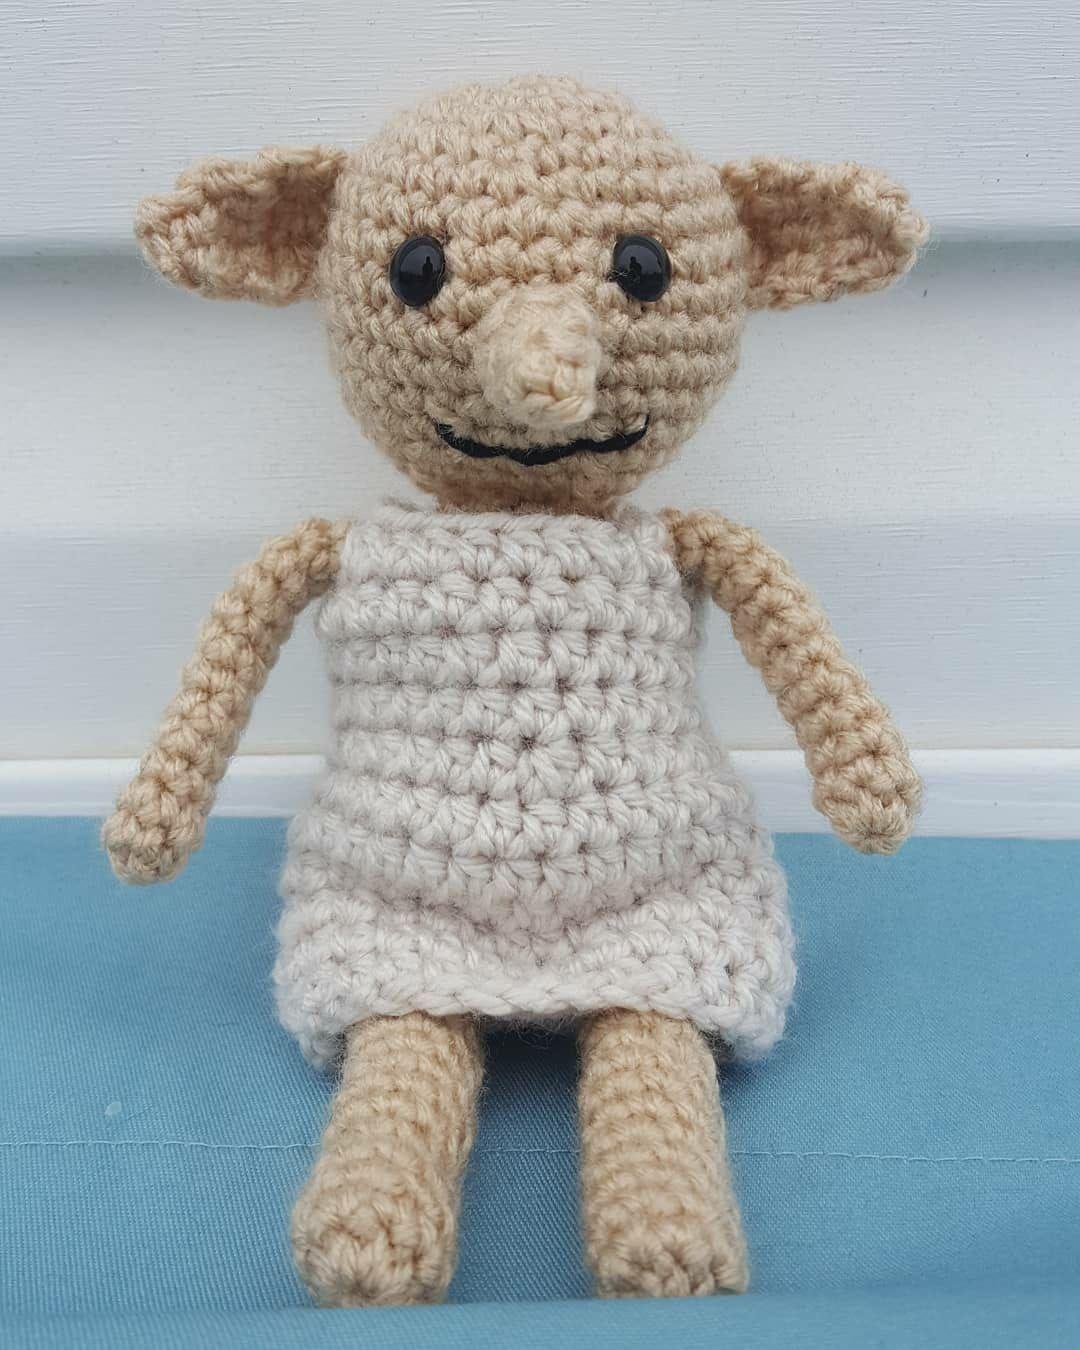 Crochet Harry Potter, Dobby the free Elf doll